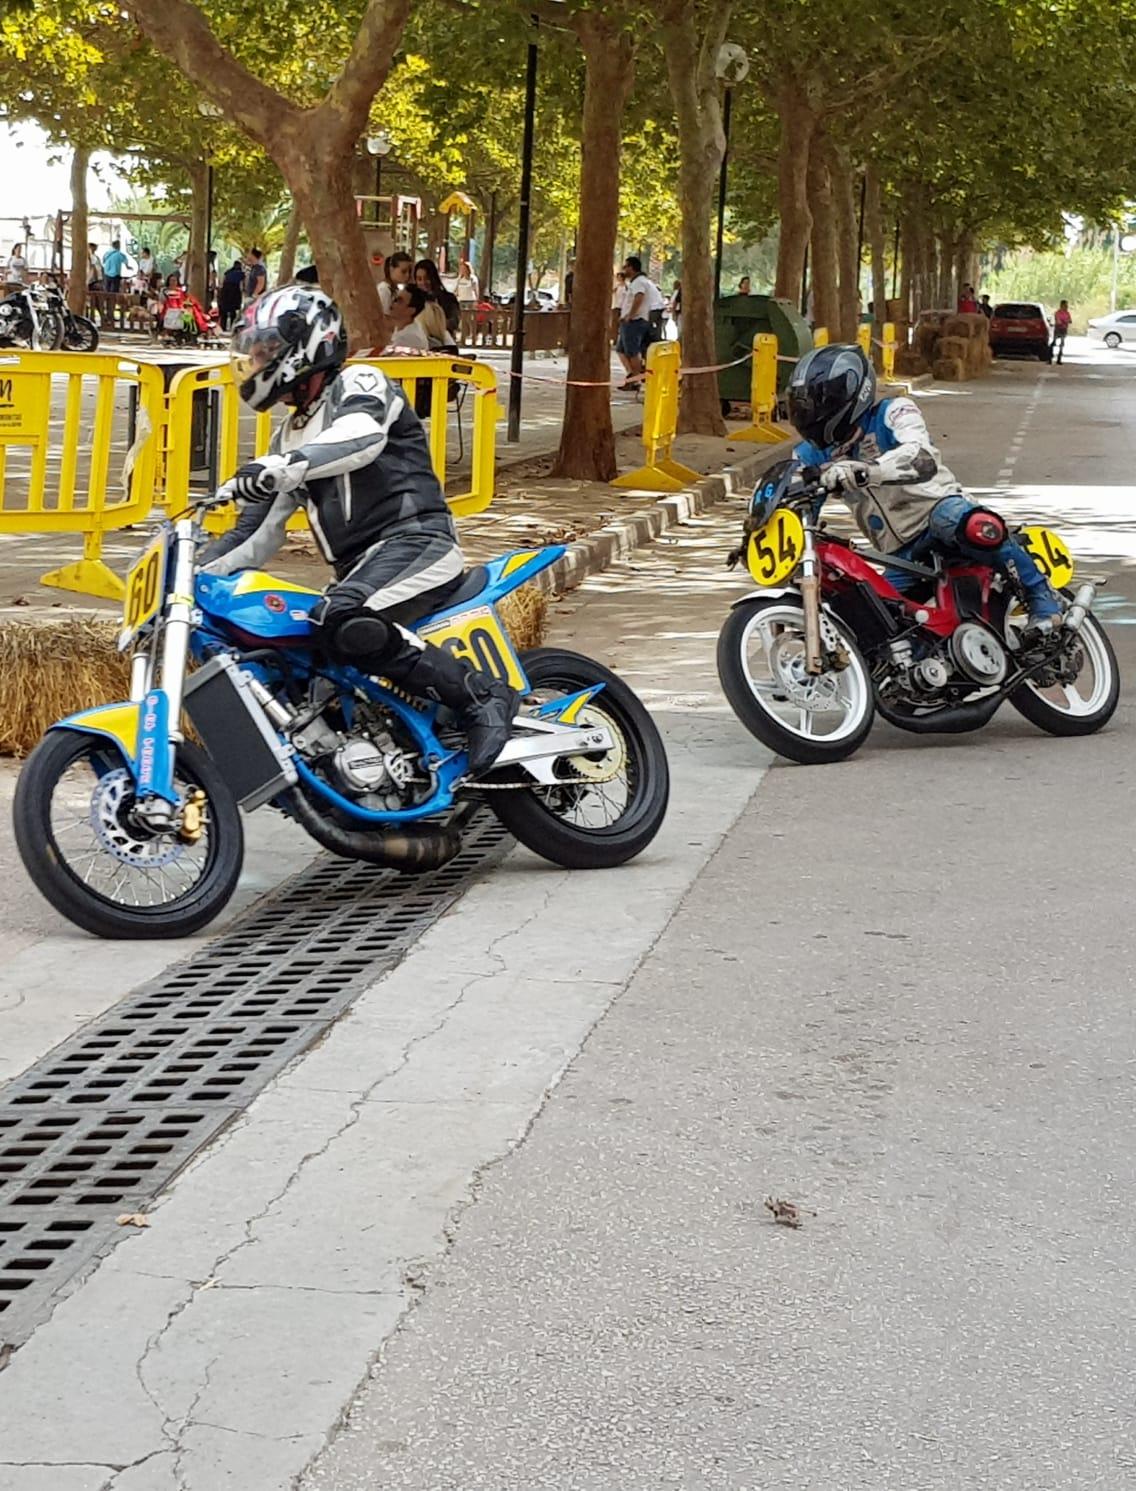 bultaco - Bultaco Frontera APM18 125 Dirt-Track 2mi3rqv